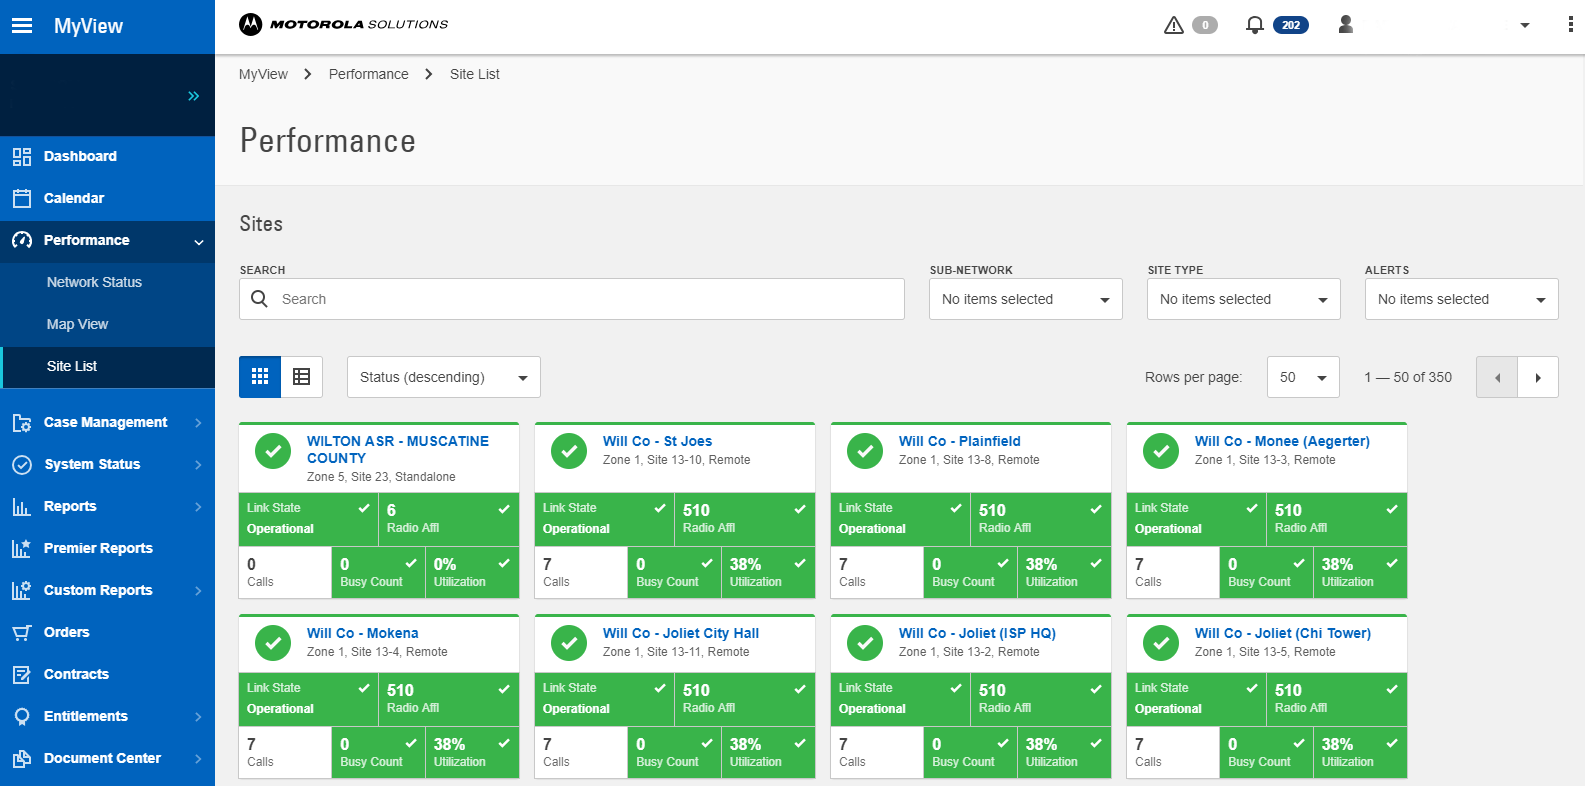 MyView Portal - Motorola Solutions